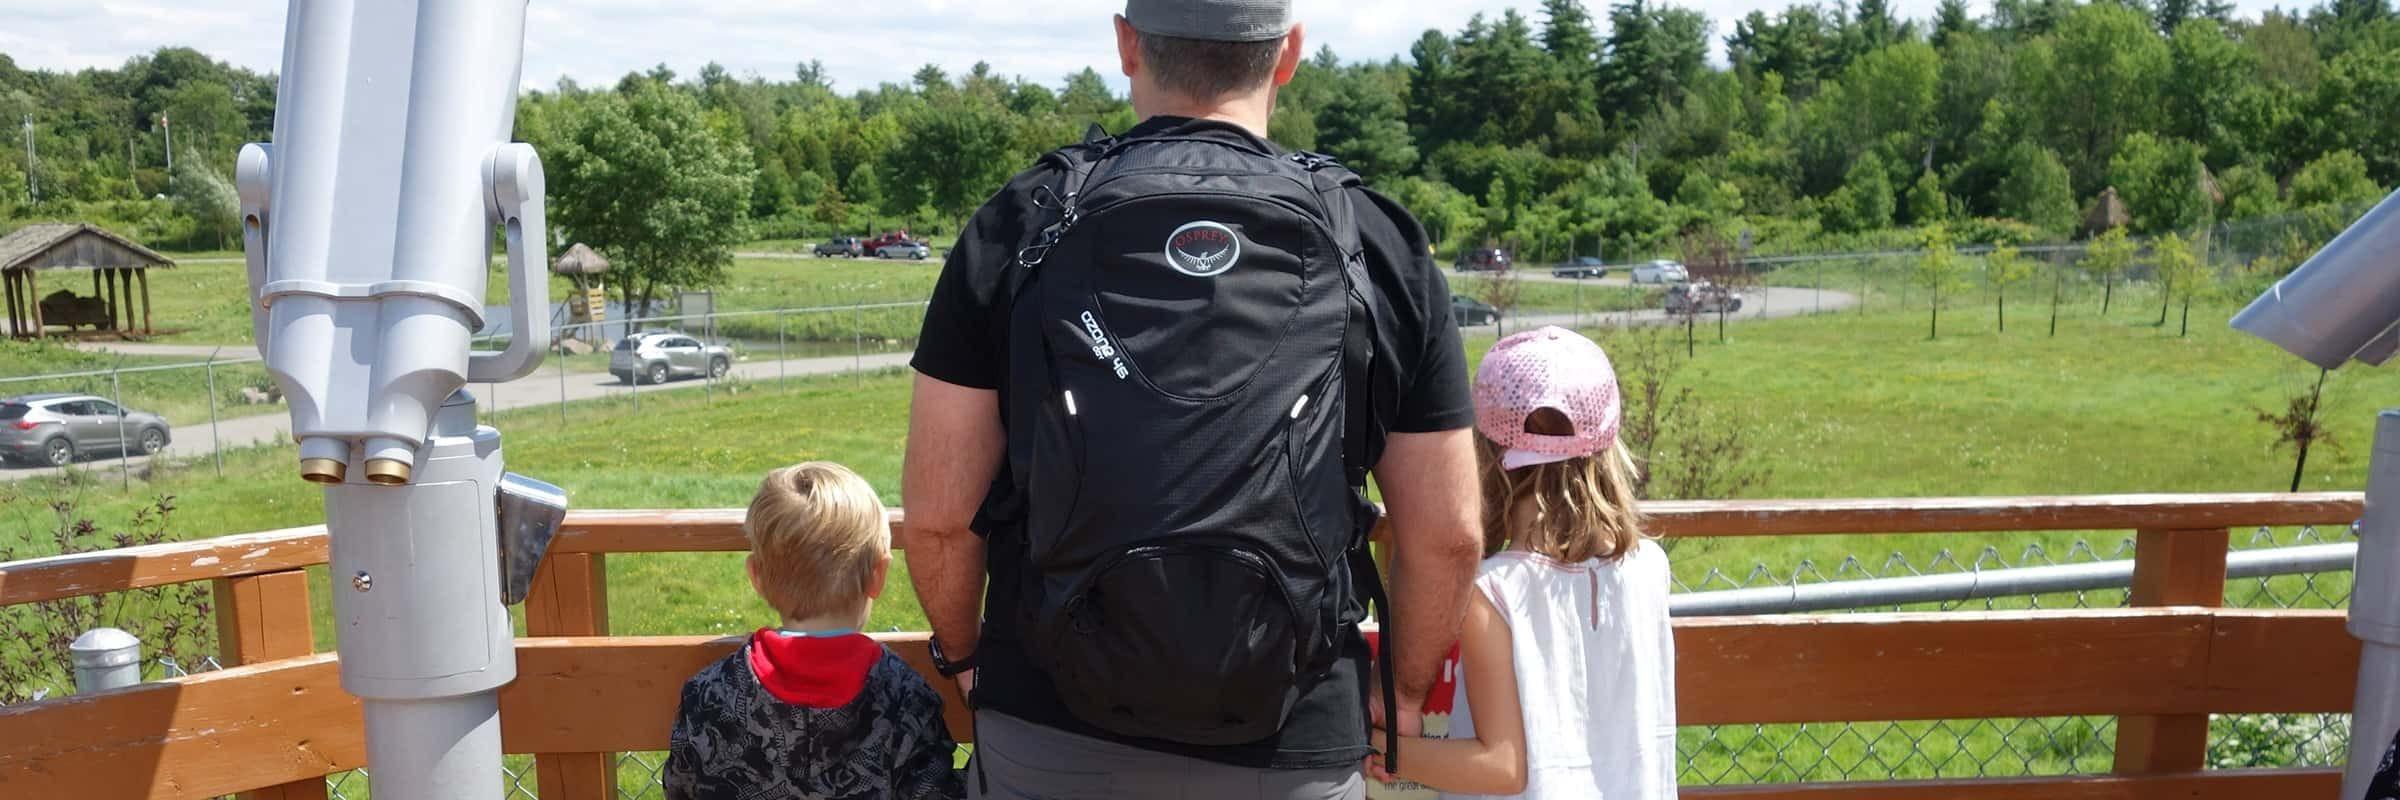 Osprey. Osprey Ozone 46L Travel Backpack Reviewed